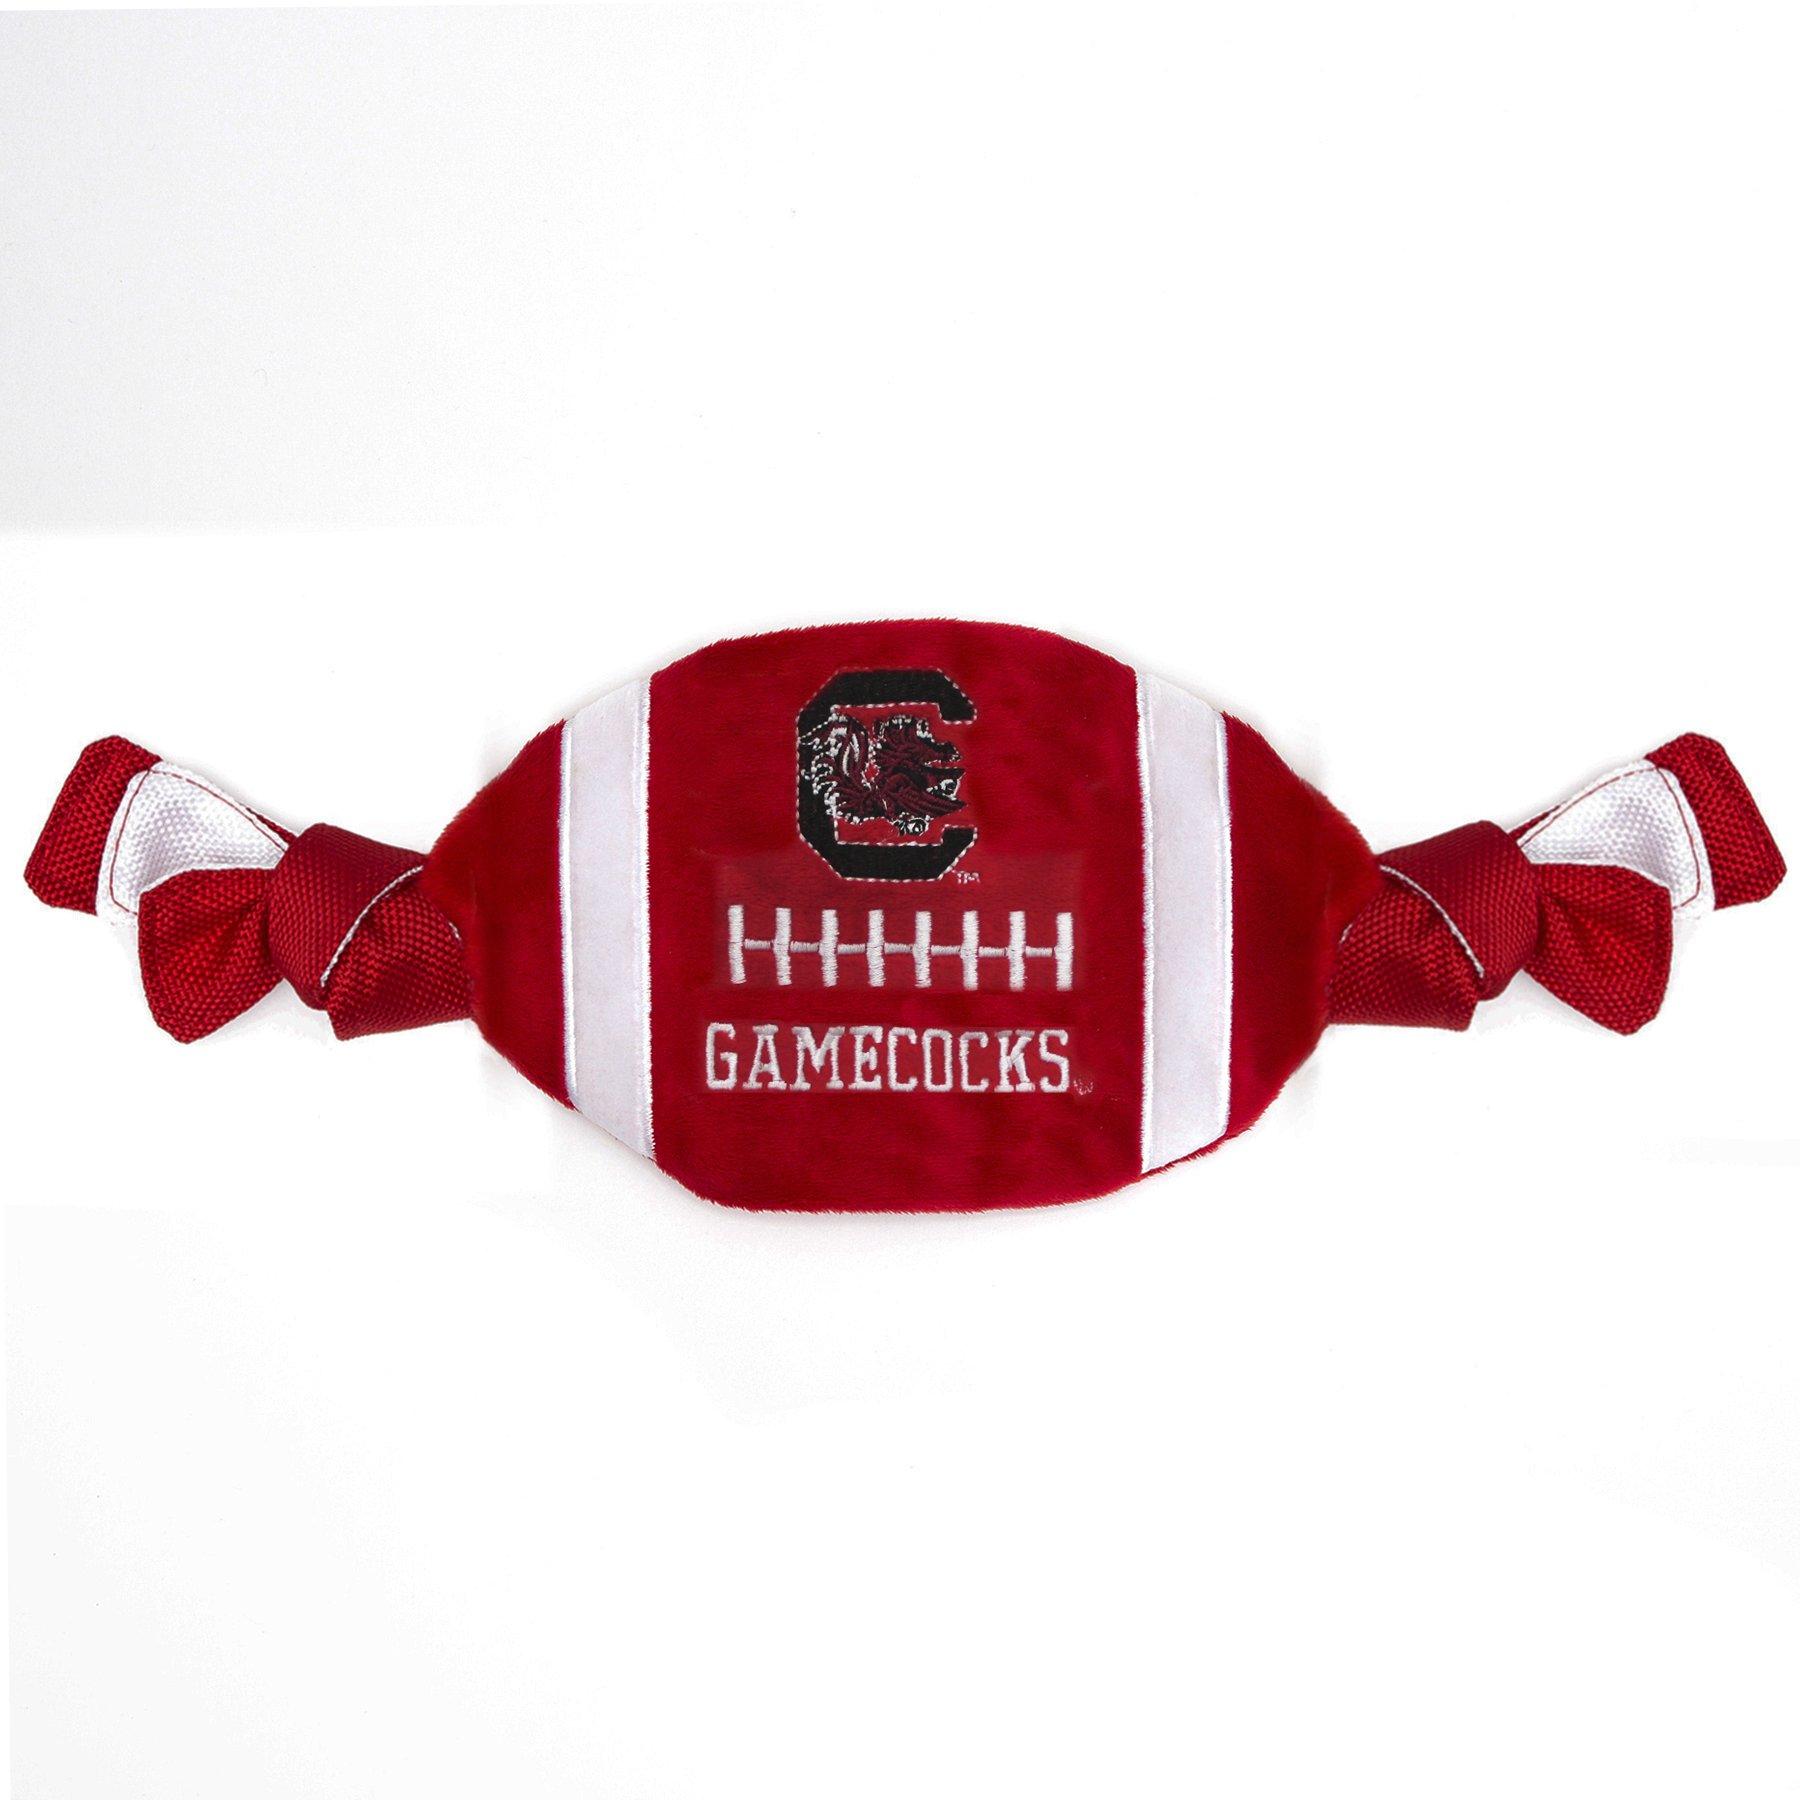 NCAA South Carolina Gamecocks Plush & Crinkle Flatty Football Pet Toy Tough Ropes Dogs & Cats